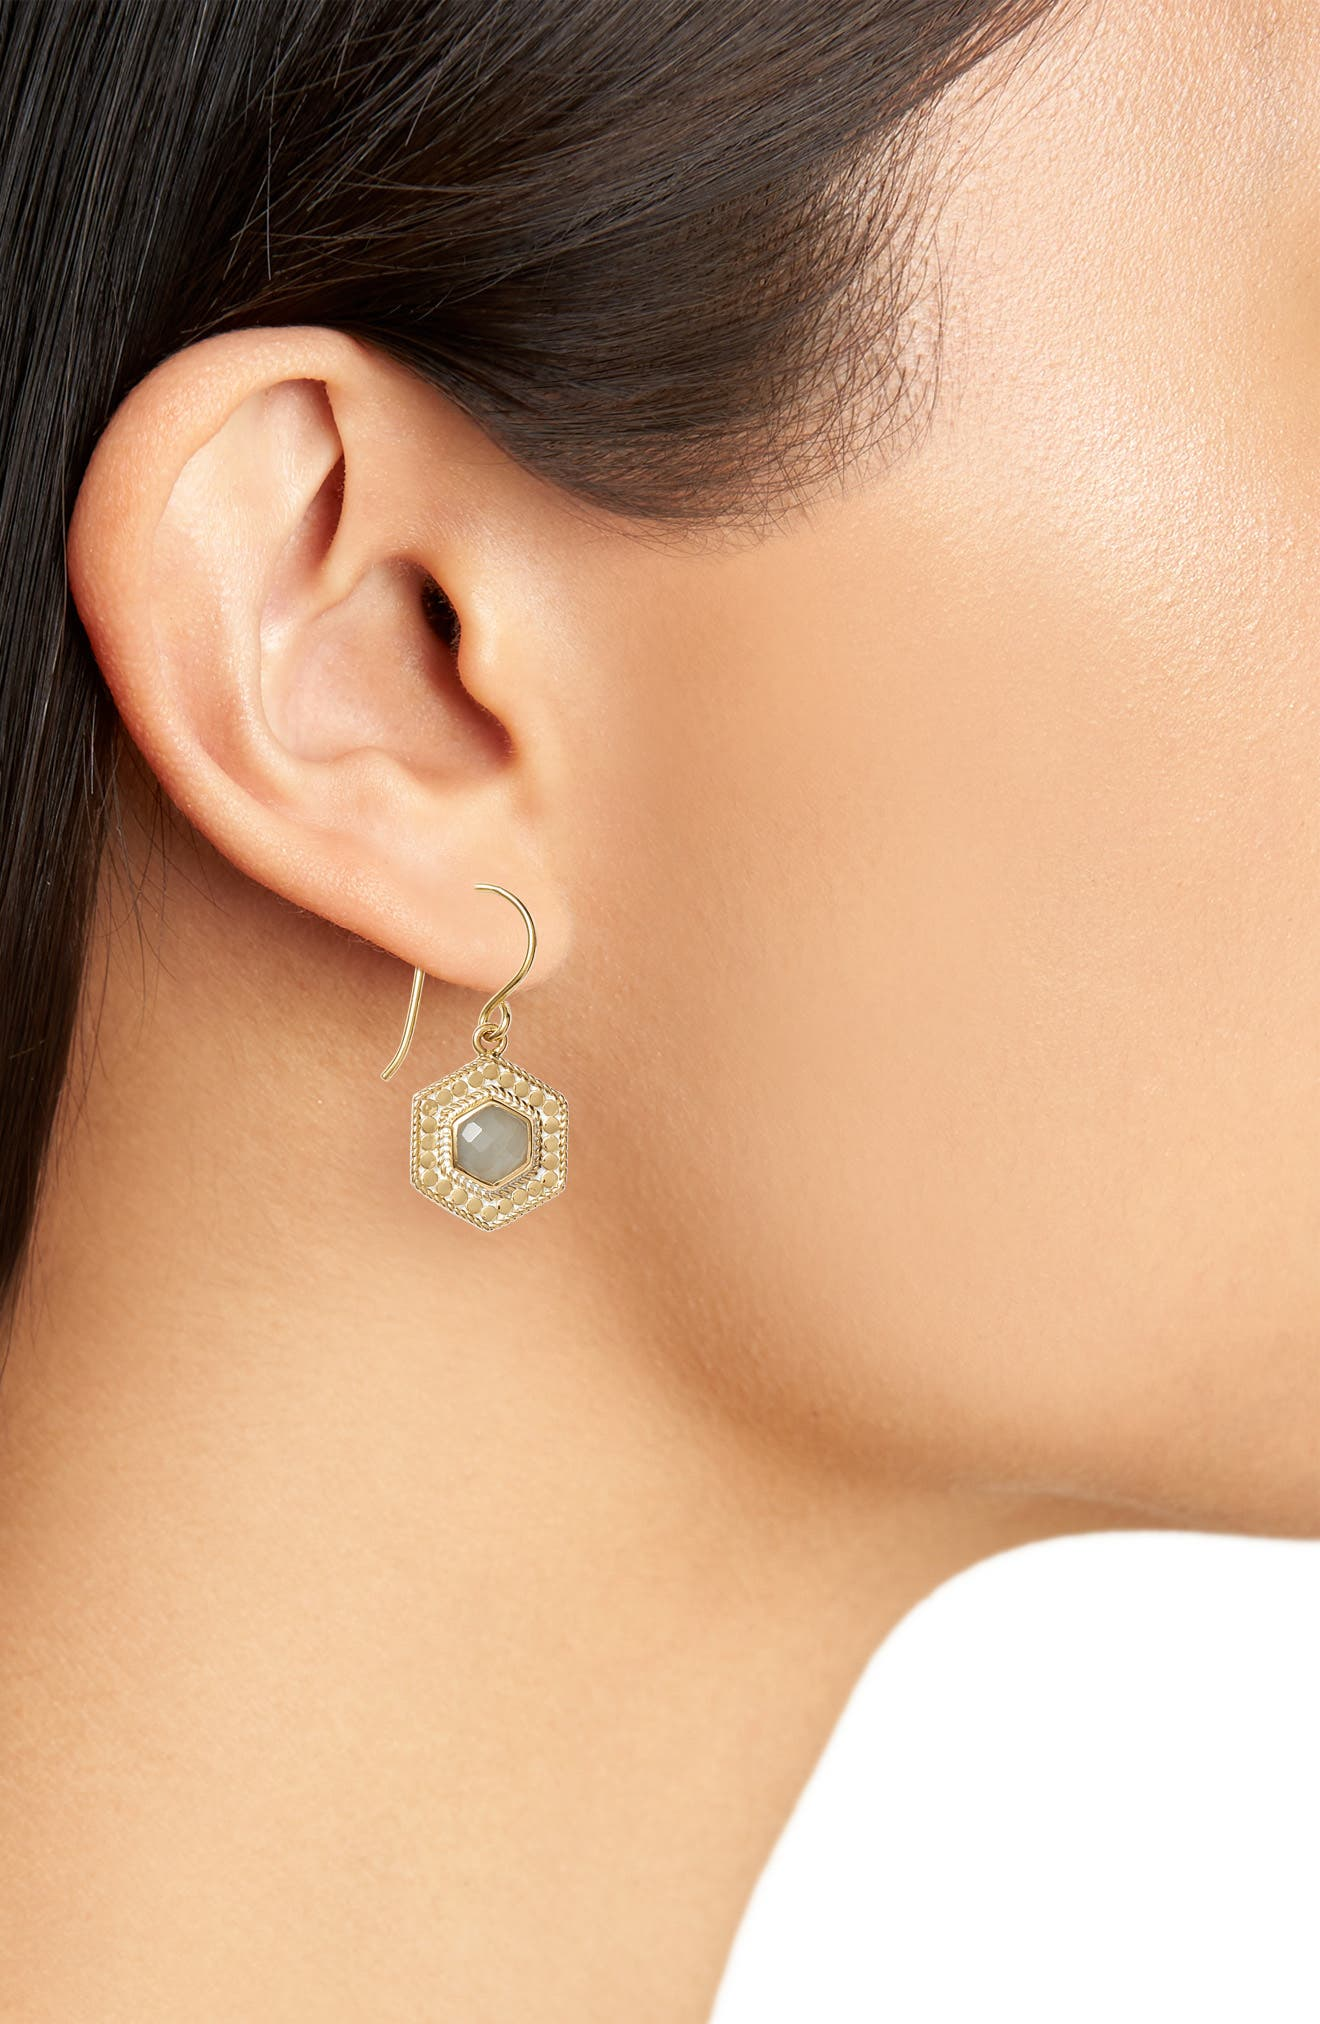 Grey Moonstone Hexagon Drop Earrings,                             Alternate thumbnail 2, color,                             Gold/ Grey Moonstone